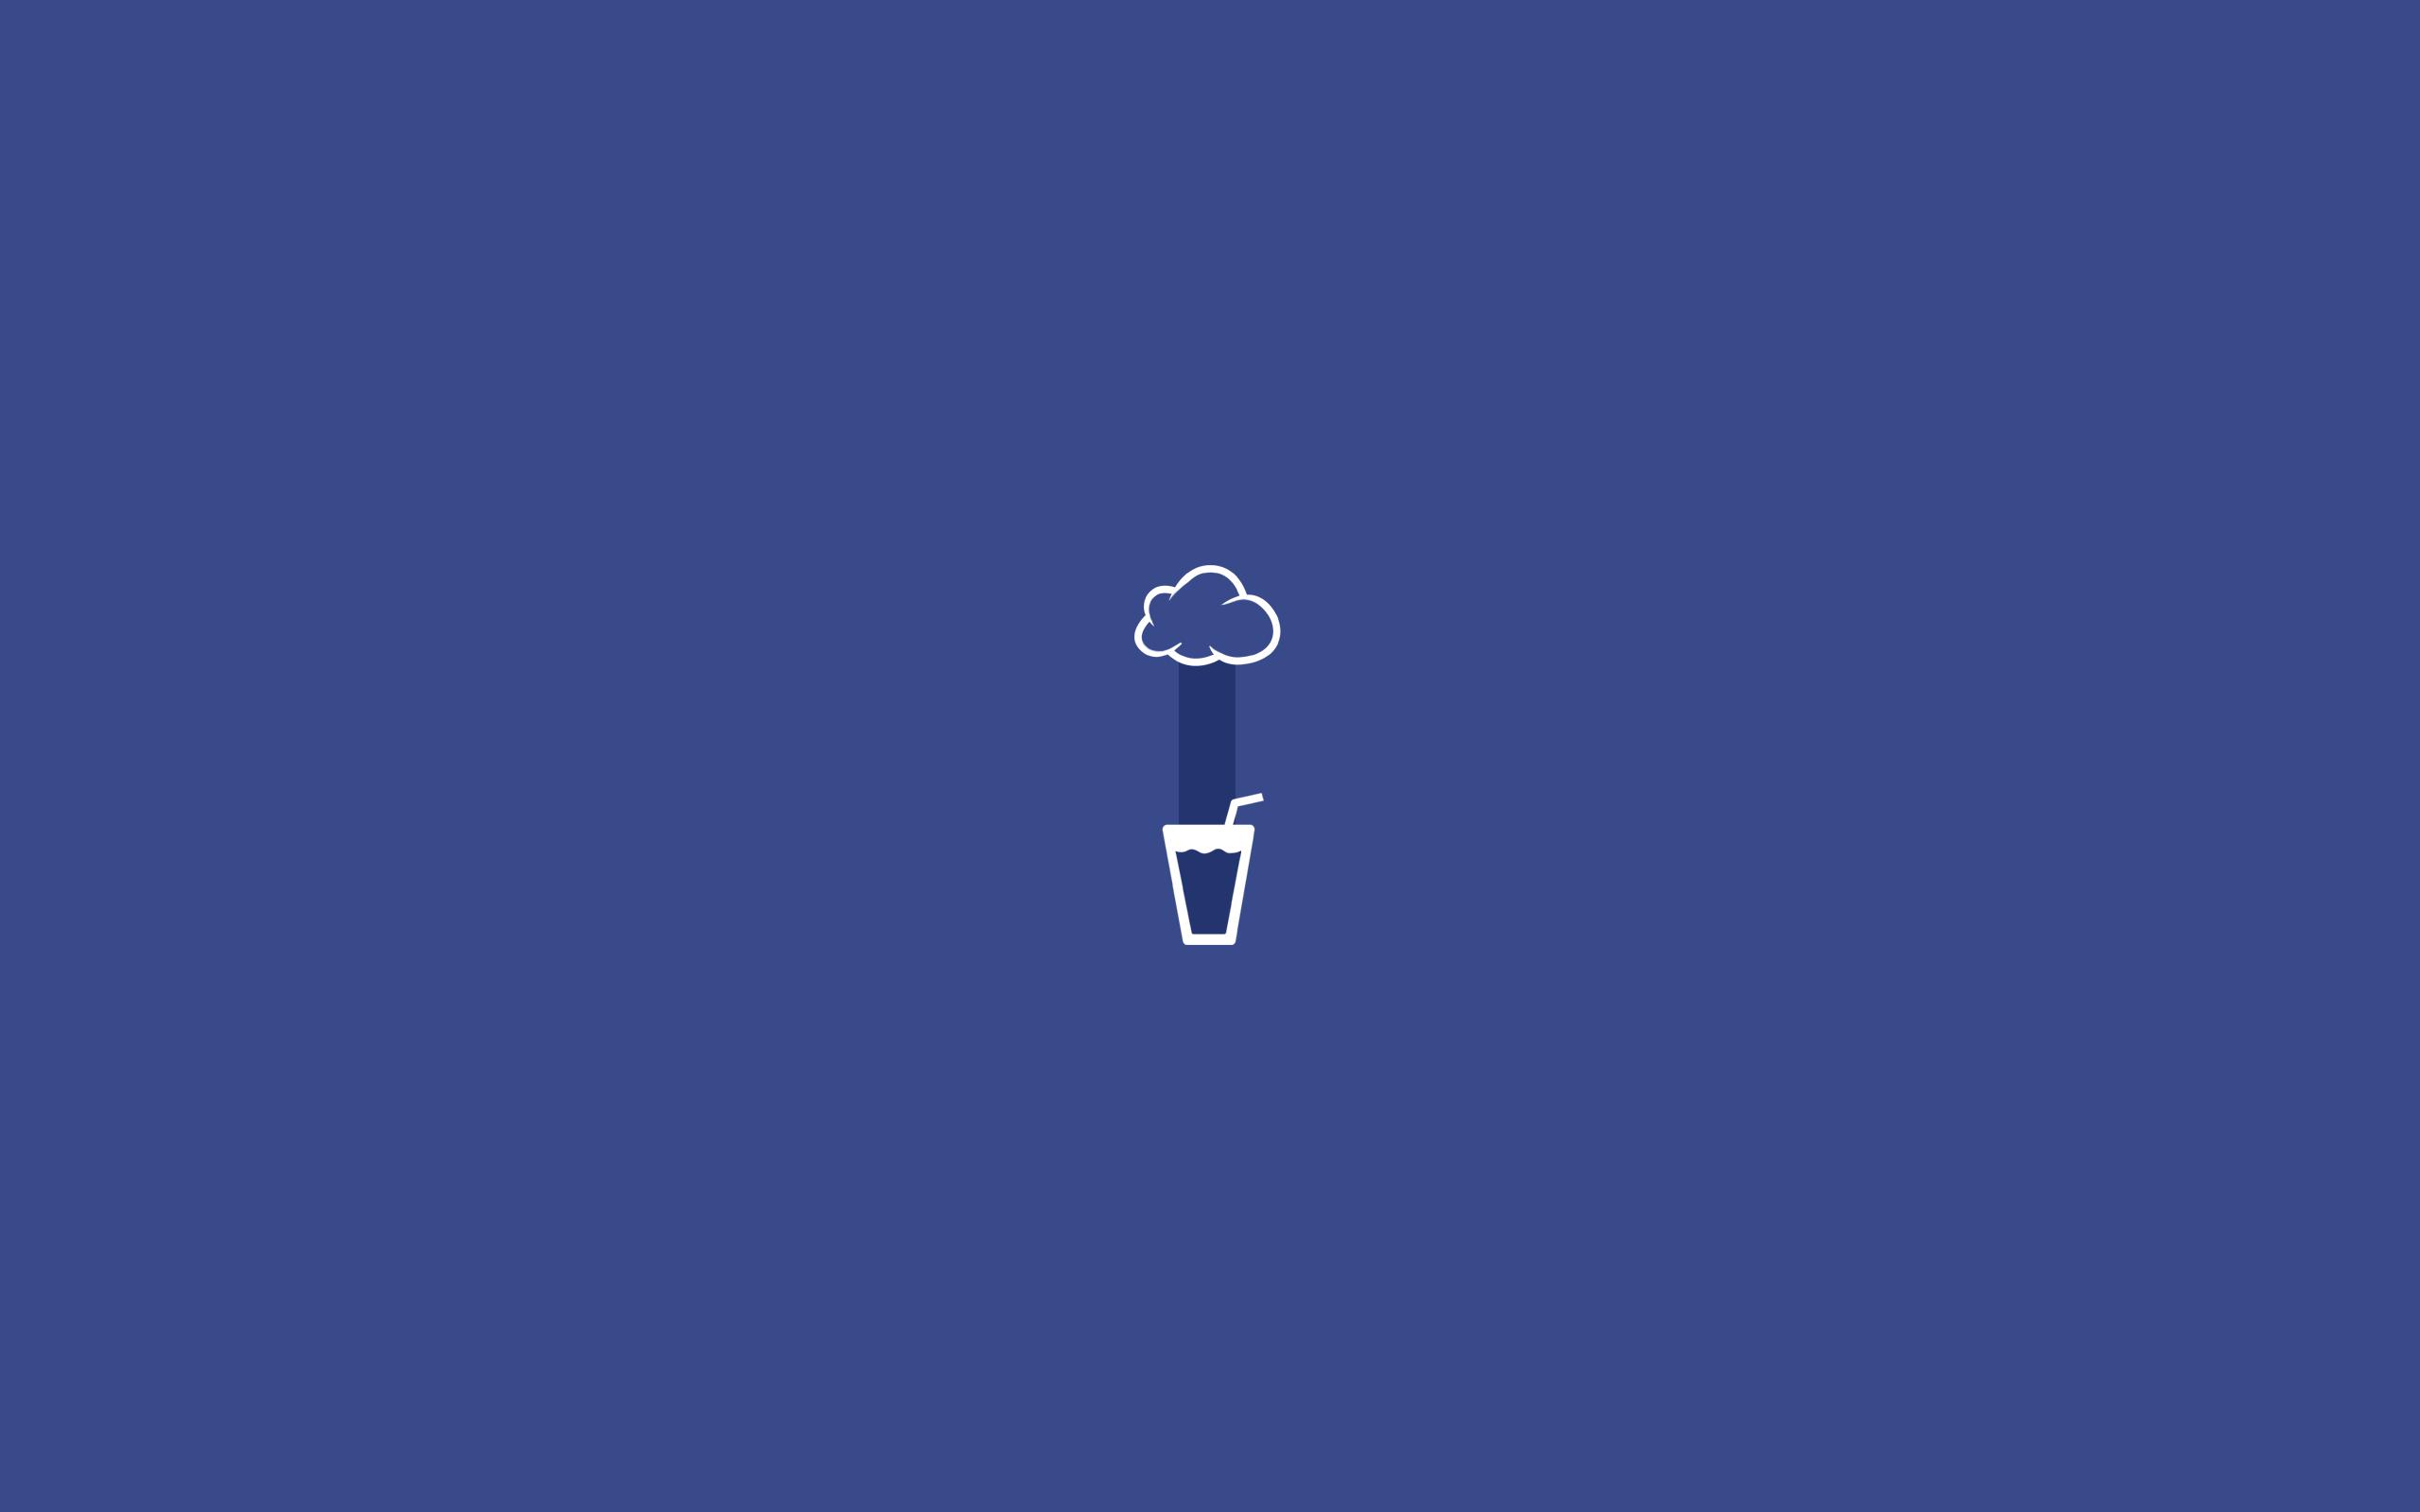 Bts Logo Desktop Minimalistic